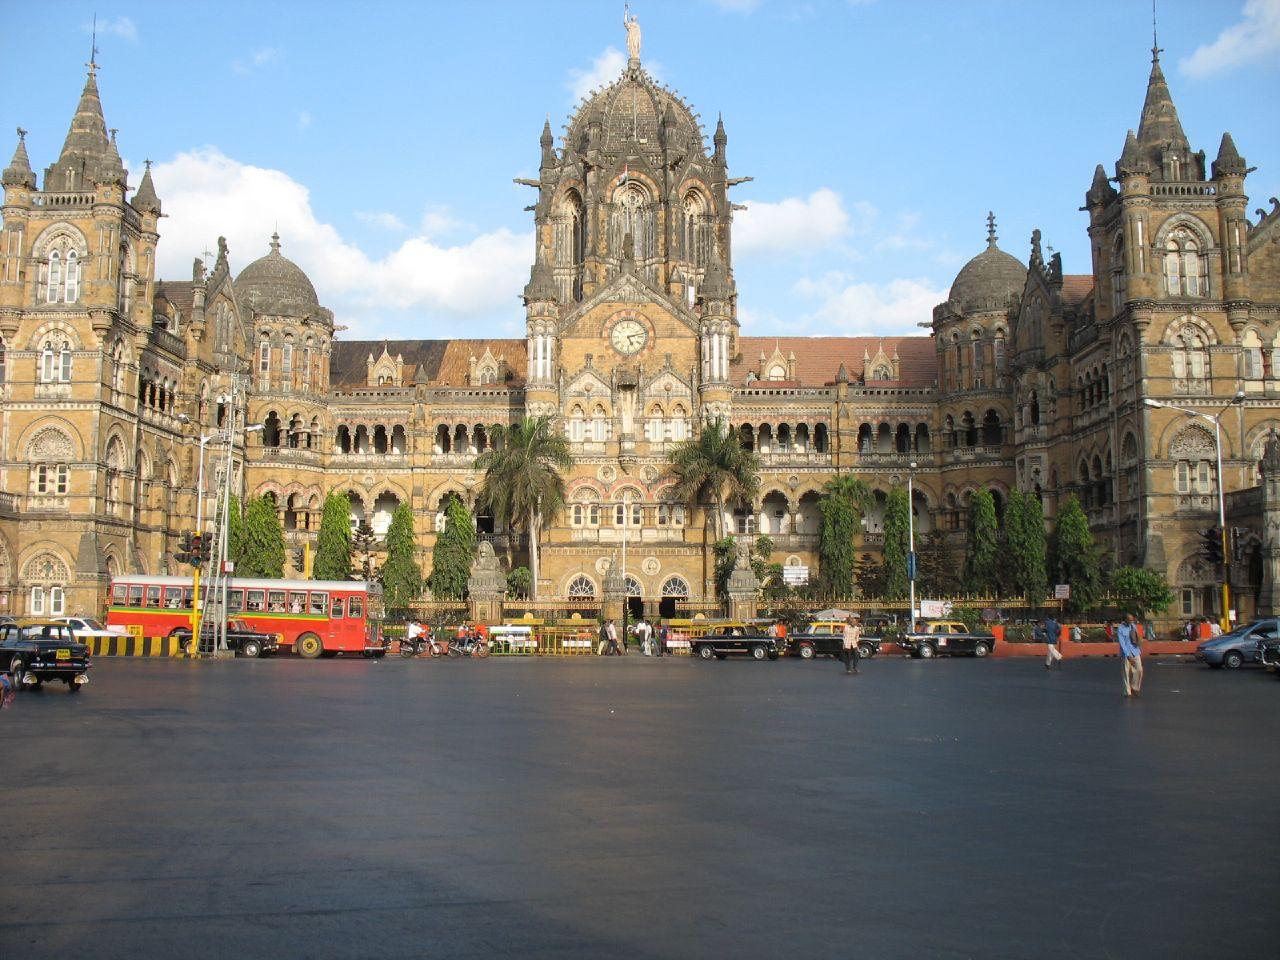 http://3.bp.blogspot.com/-ytiyvSAHU-k/UNVjrMgwOBI/AAAAAAAAE7M/r0spmESY_k4/s1600/The+Chhatrapati+Shivaji+Terminus+Mumbai+Railway+Station+7.jpg